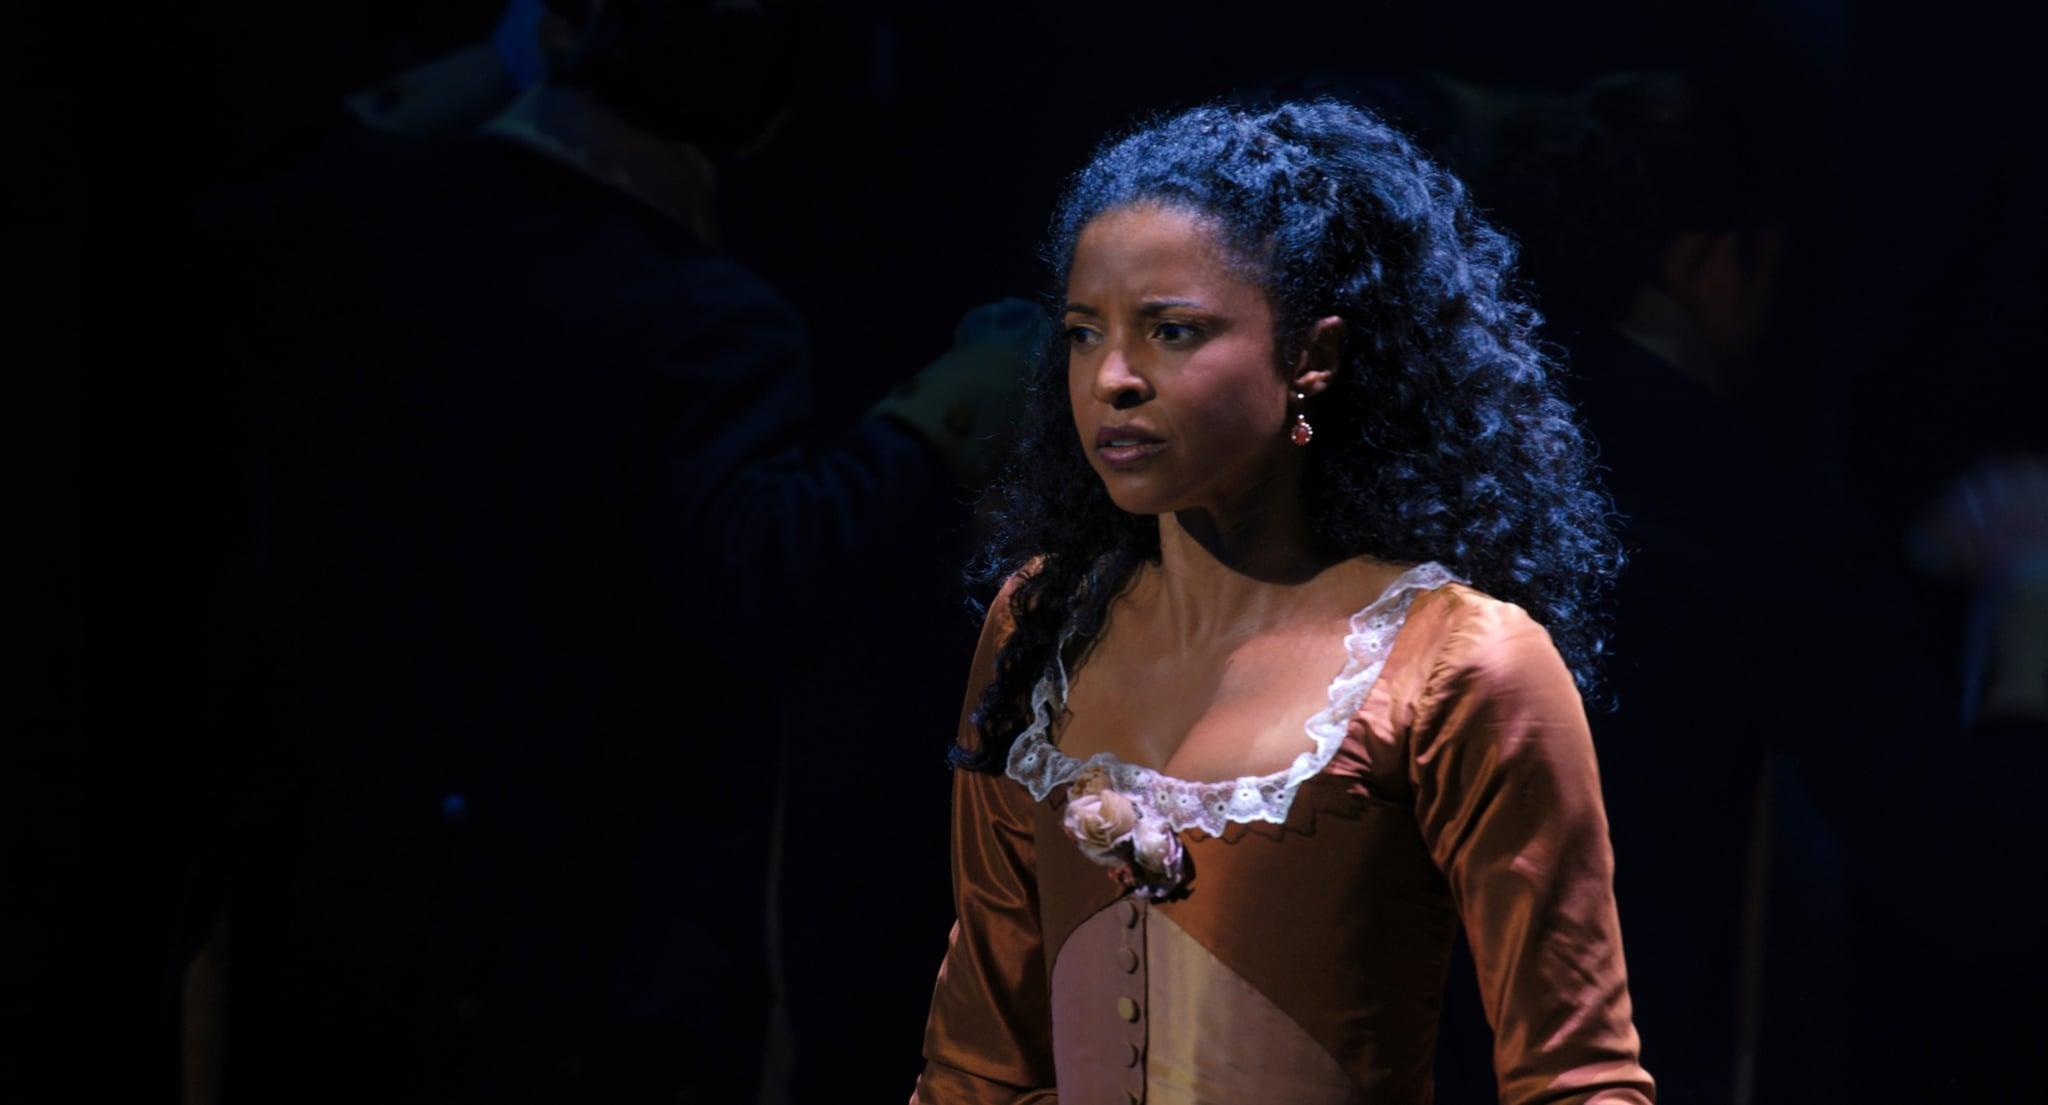 HAMILTON, Renee Elise Goldsberry as Angelica Schuyler, 2020.  Disney+ / Courtesy Everett Collection